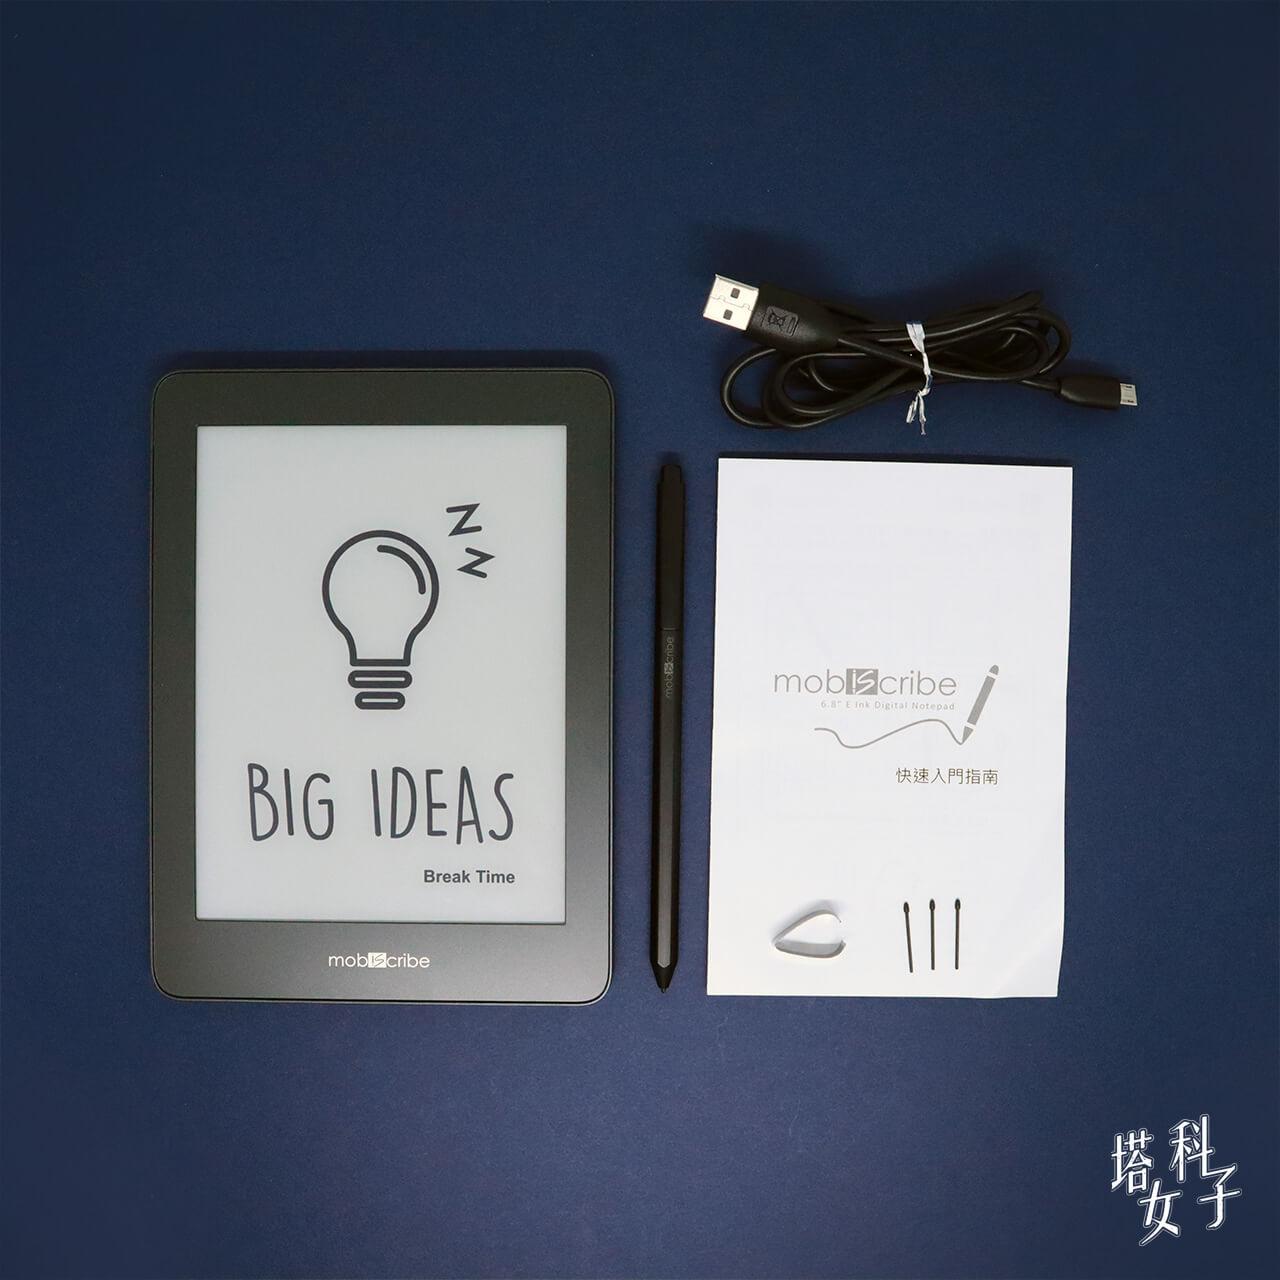 Mobiscribe 電子筆記本+閱讀器 開箱評測 內容物